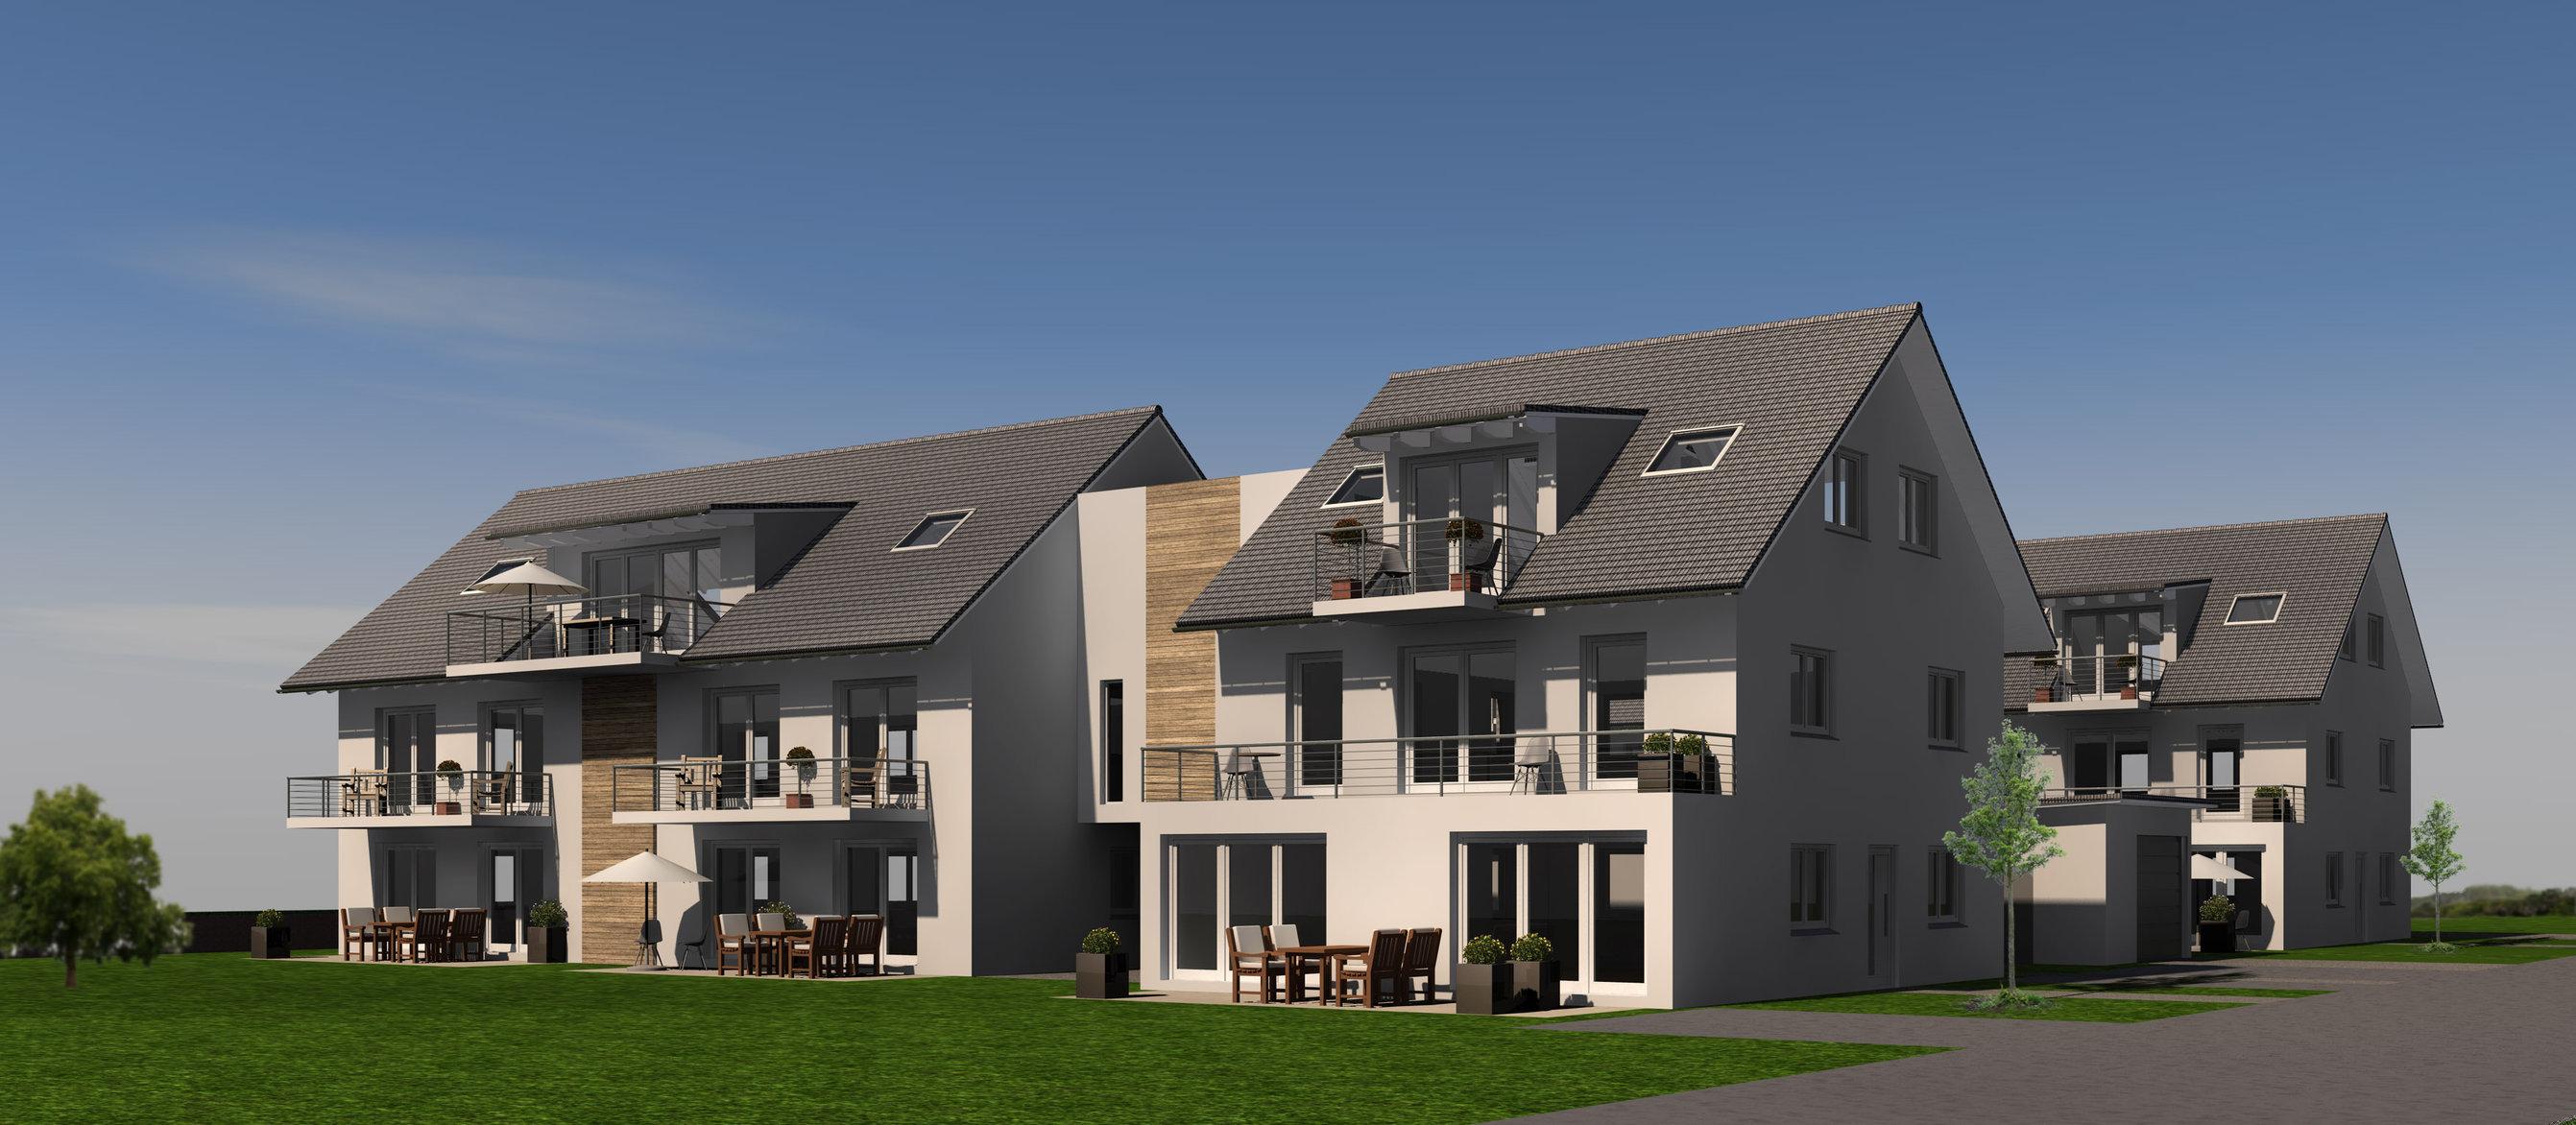 Mehrfamilienhäuser | Edling | Süd-Ost